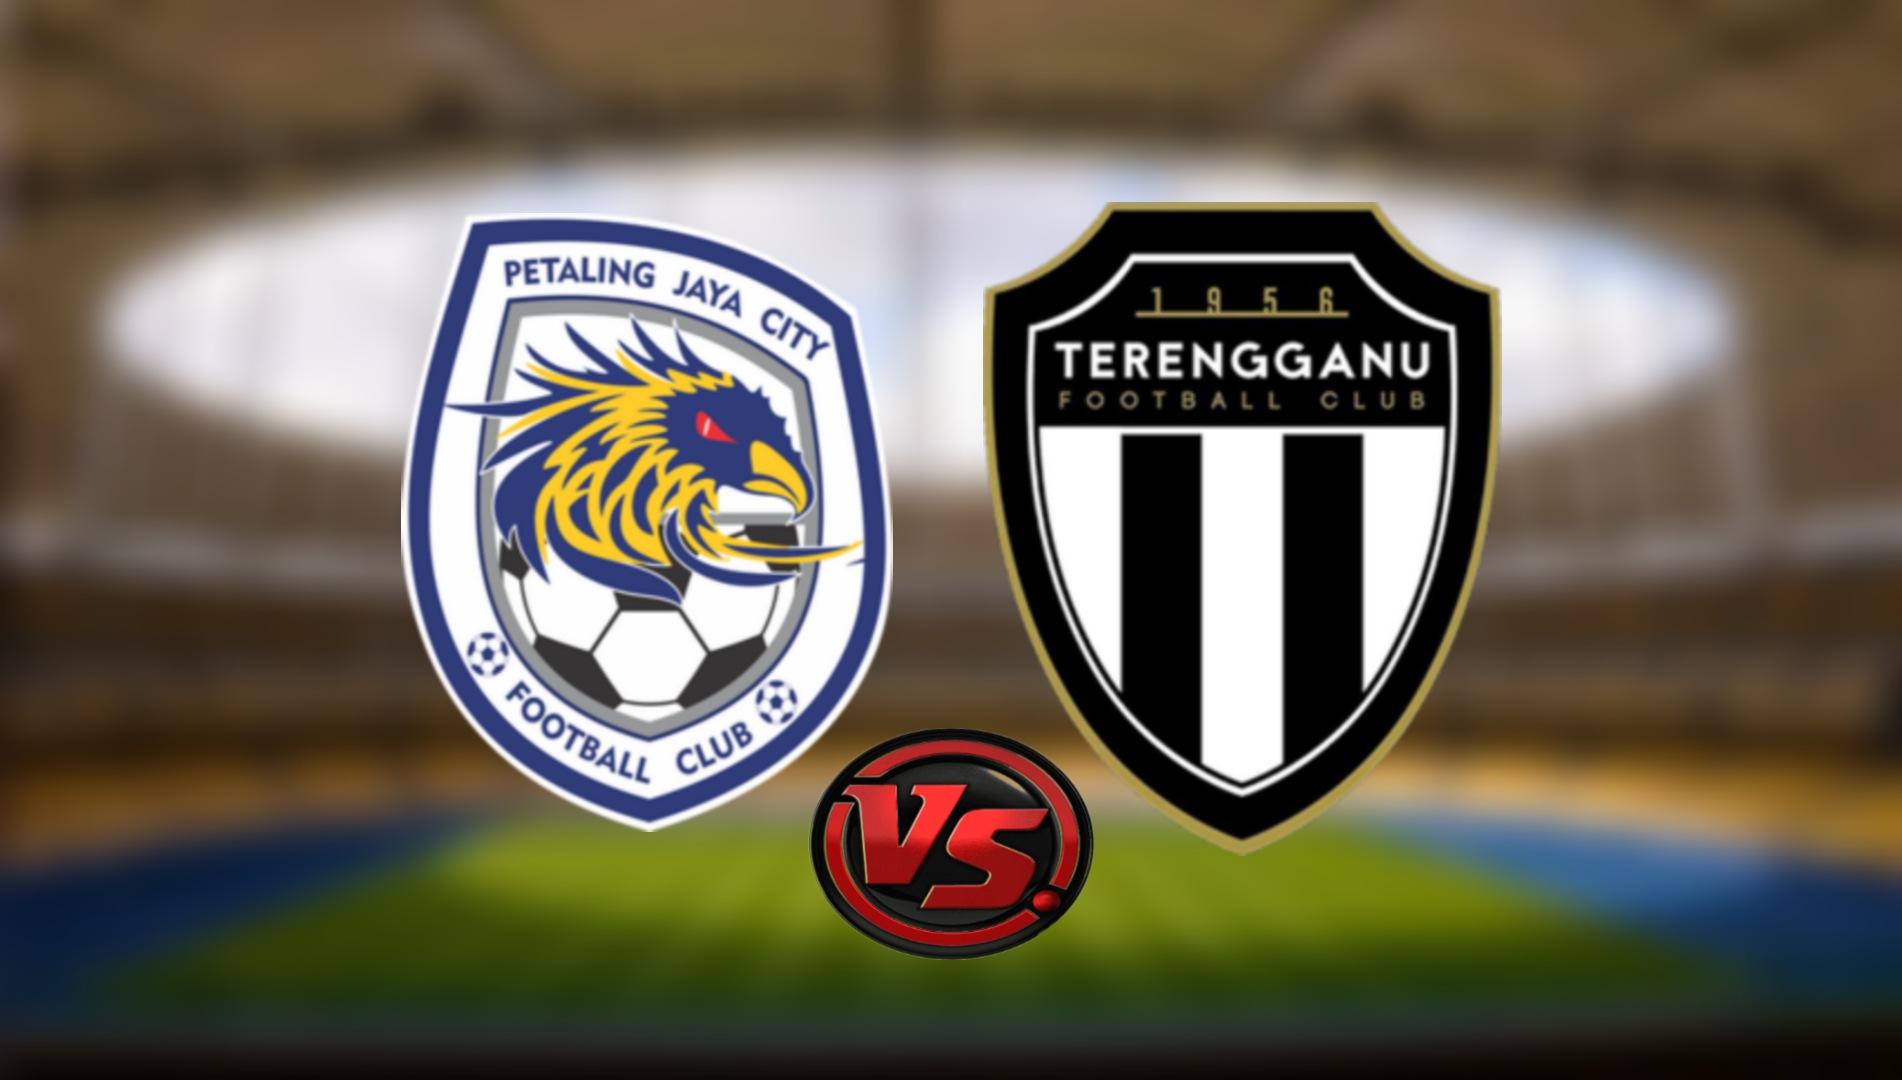 Live Streaming PJ City FC vs Terengganu FC Liga Super 4.8.2021